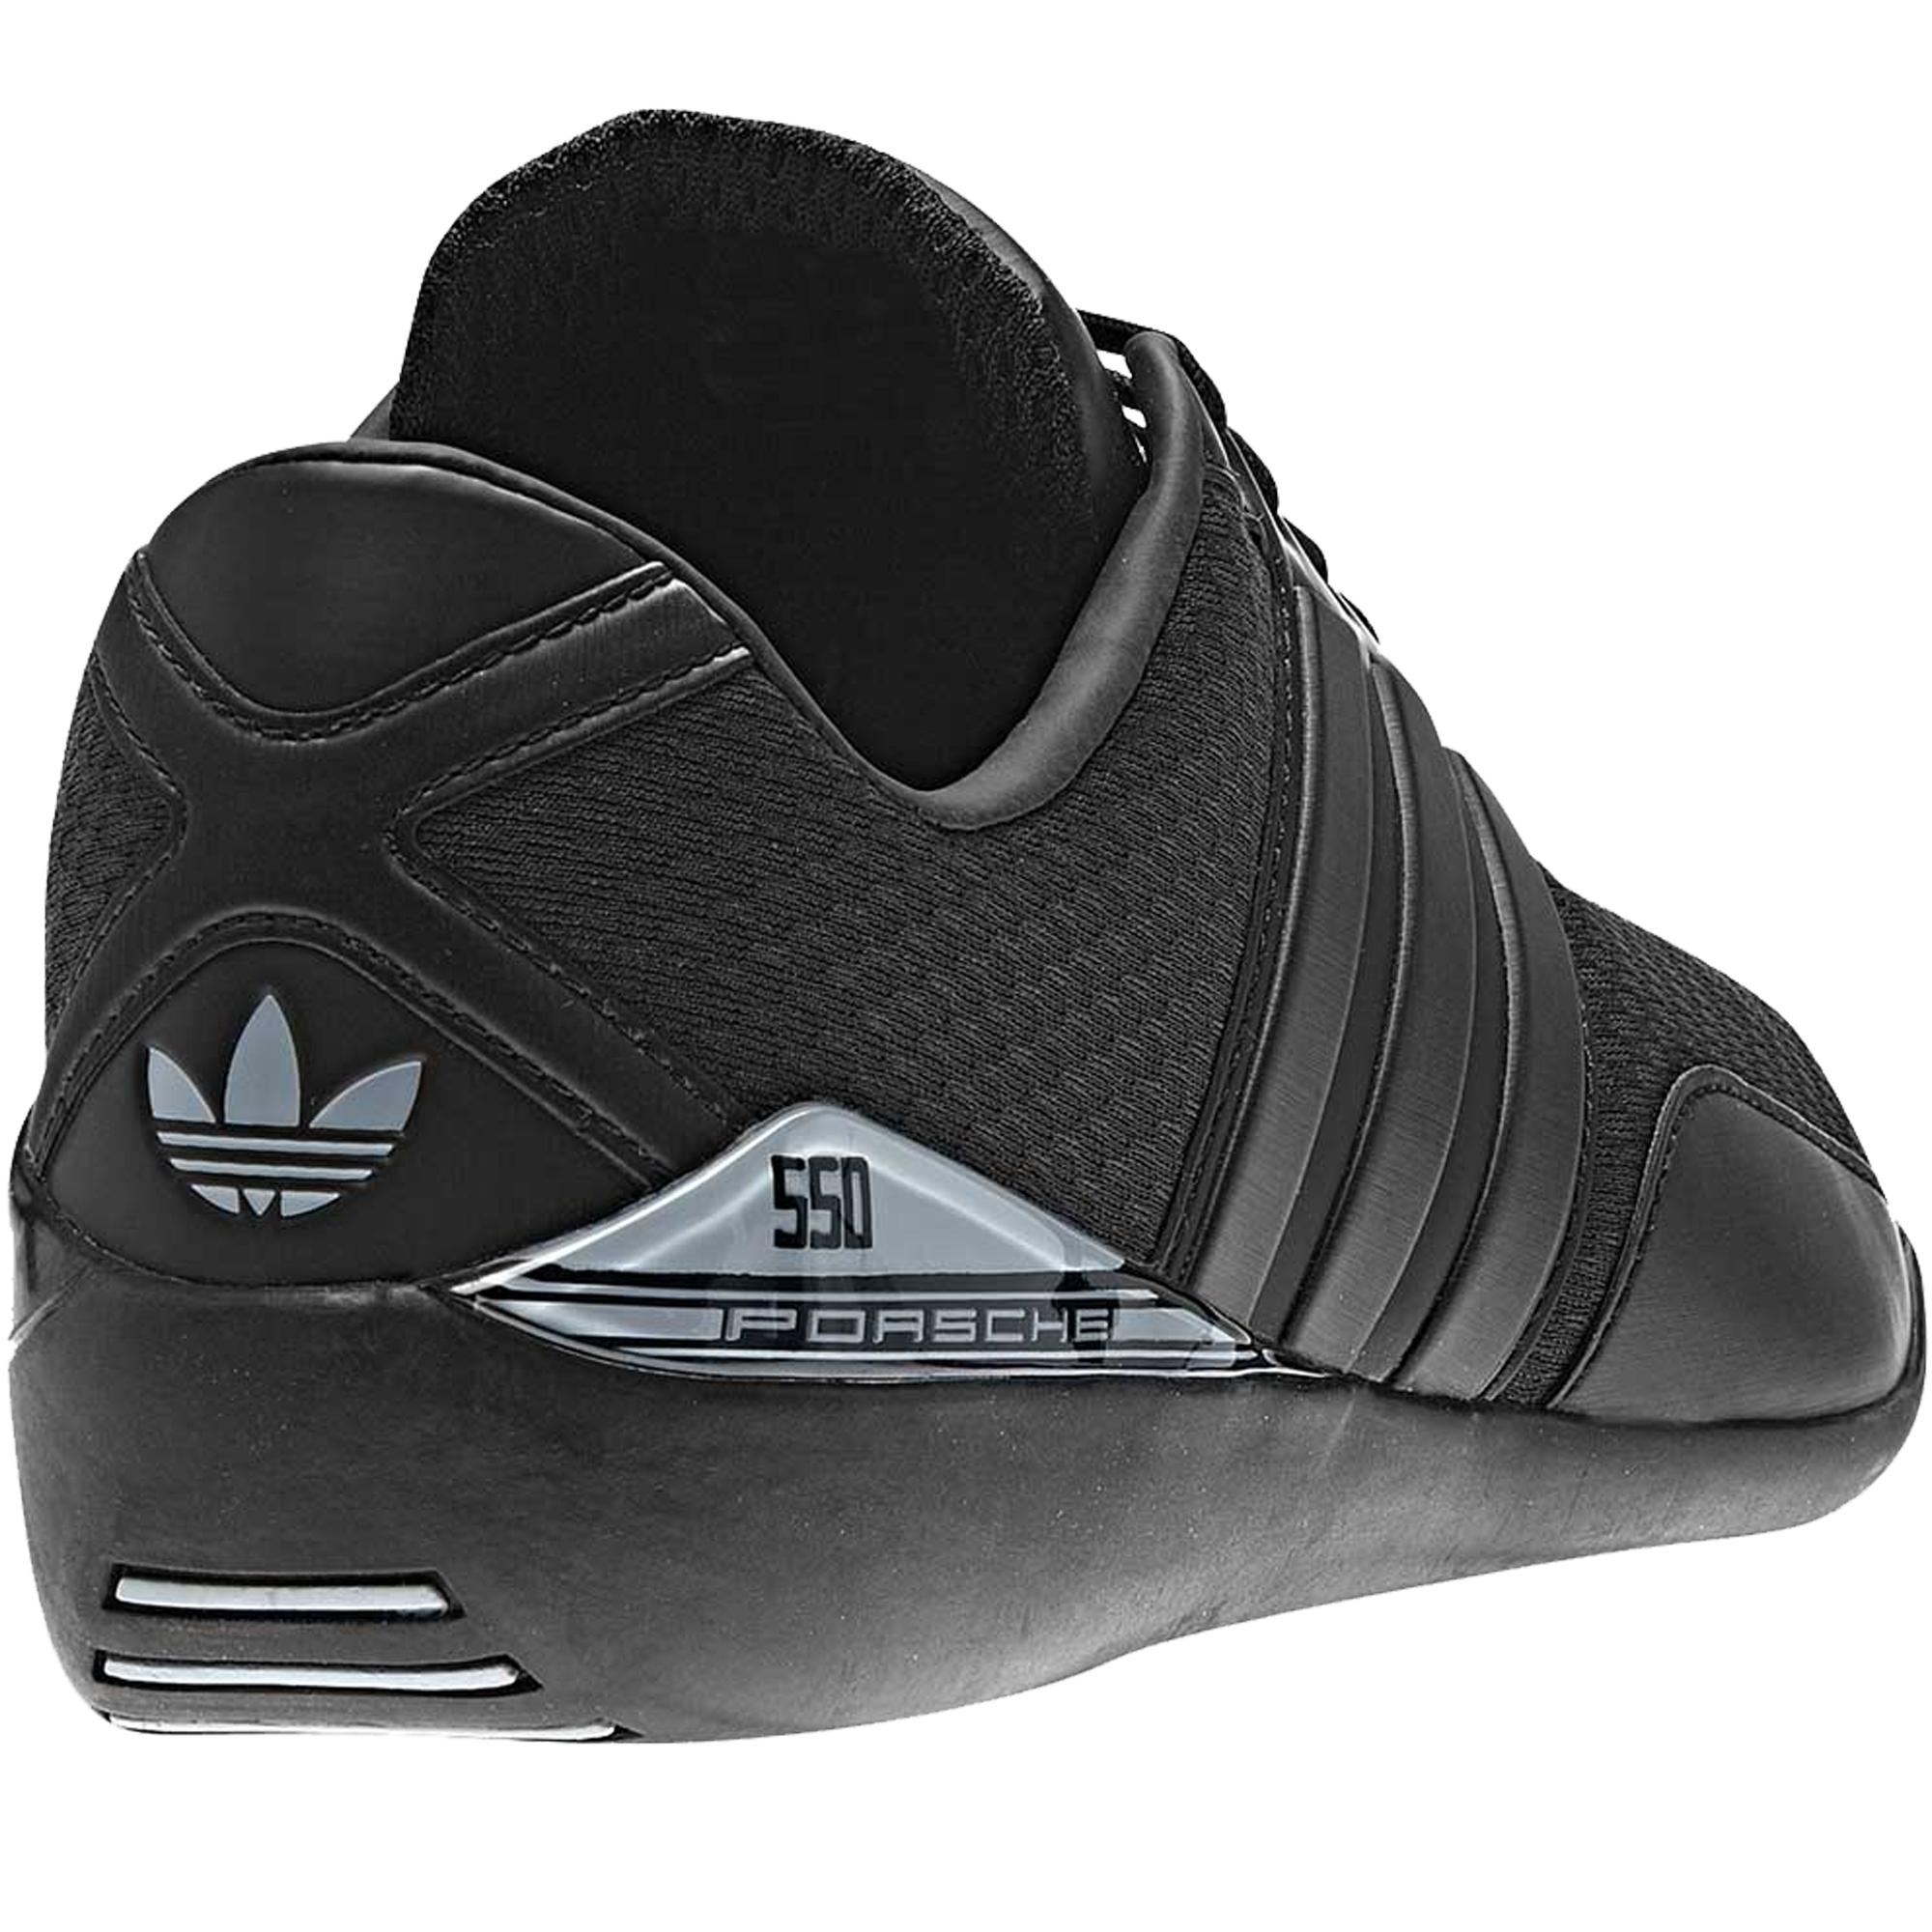 0eec79cd806f ... best price adidas porsche 550 rs ss13 erkek spor ayakkab 4d216 67396